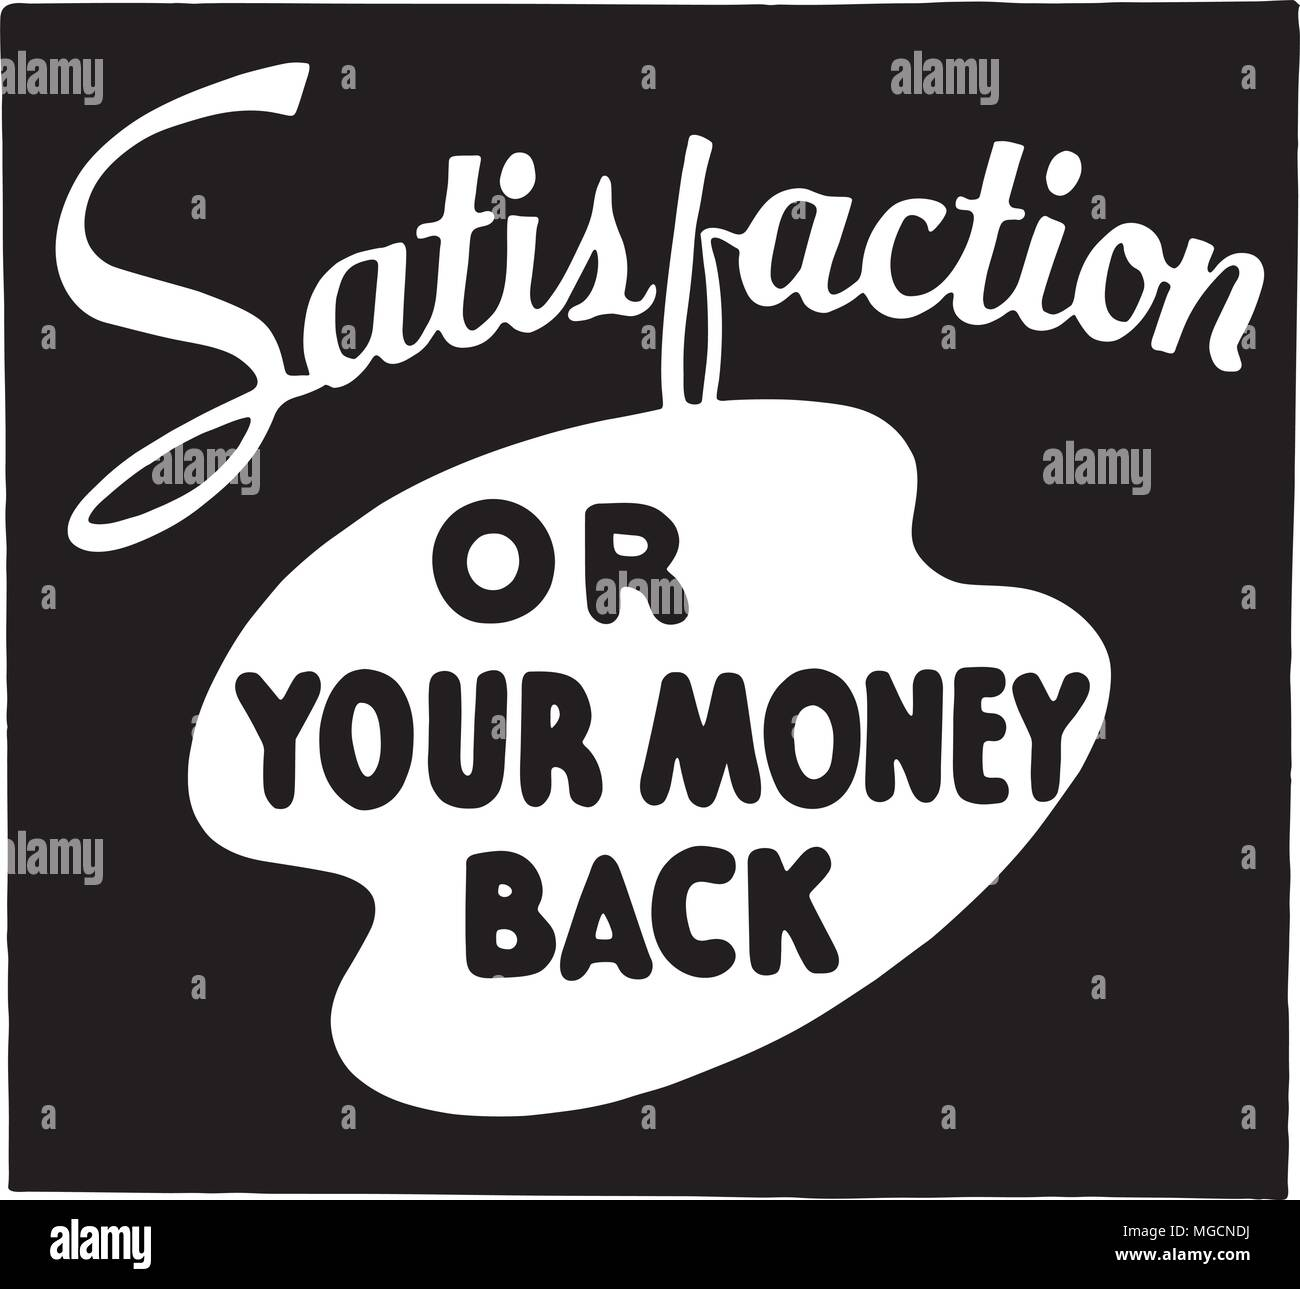 Satisfaction - Retro Ad Art Banner - Stock Vector